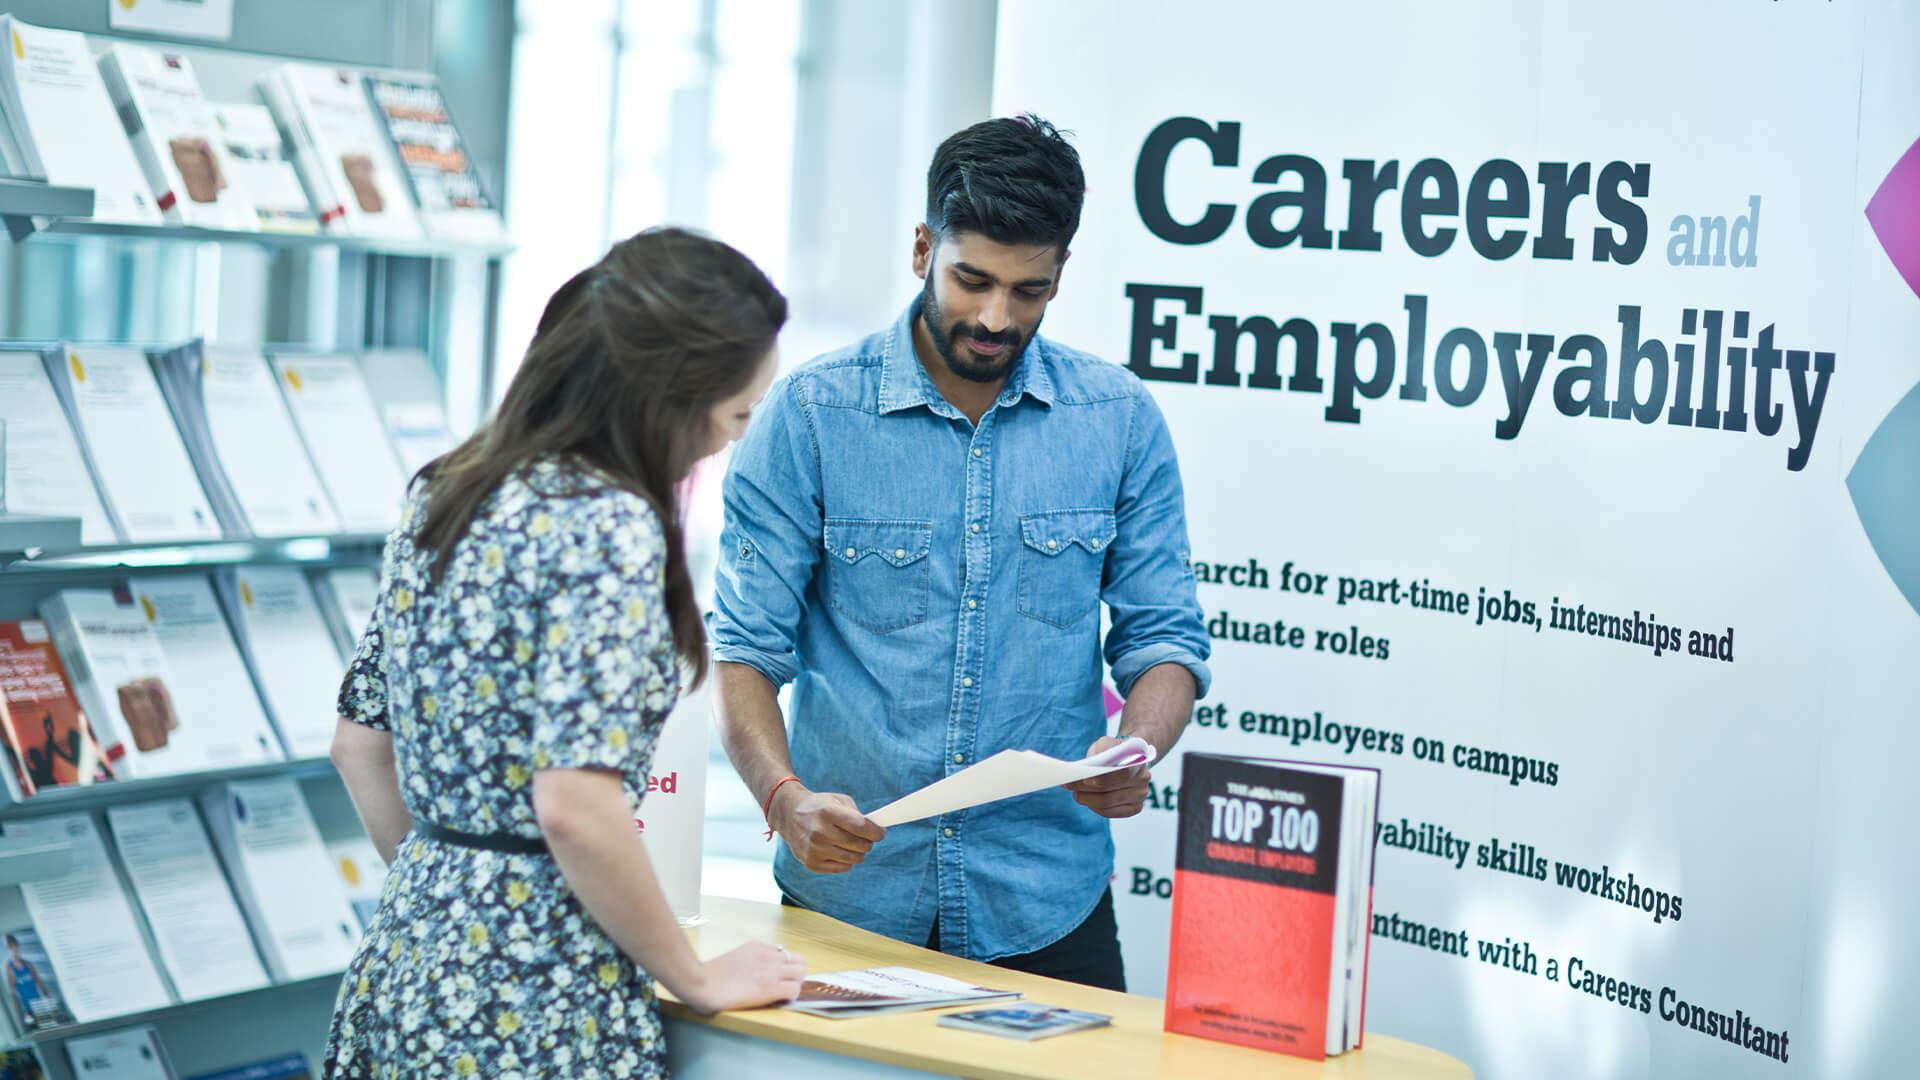 International student using Manchester Metropolitan University's careers and employability service